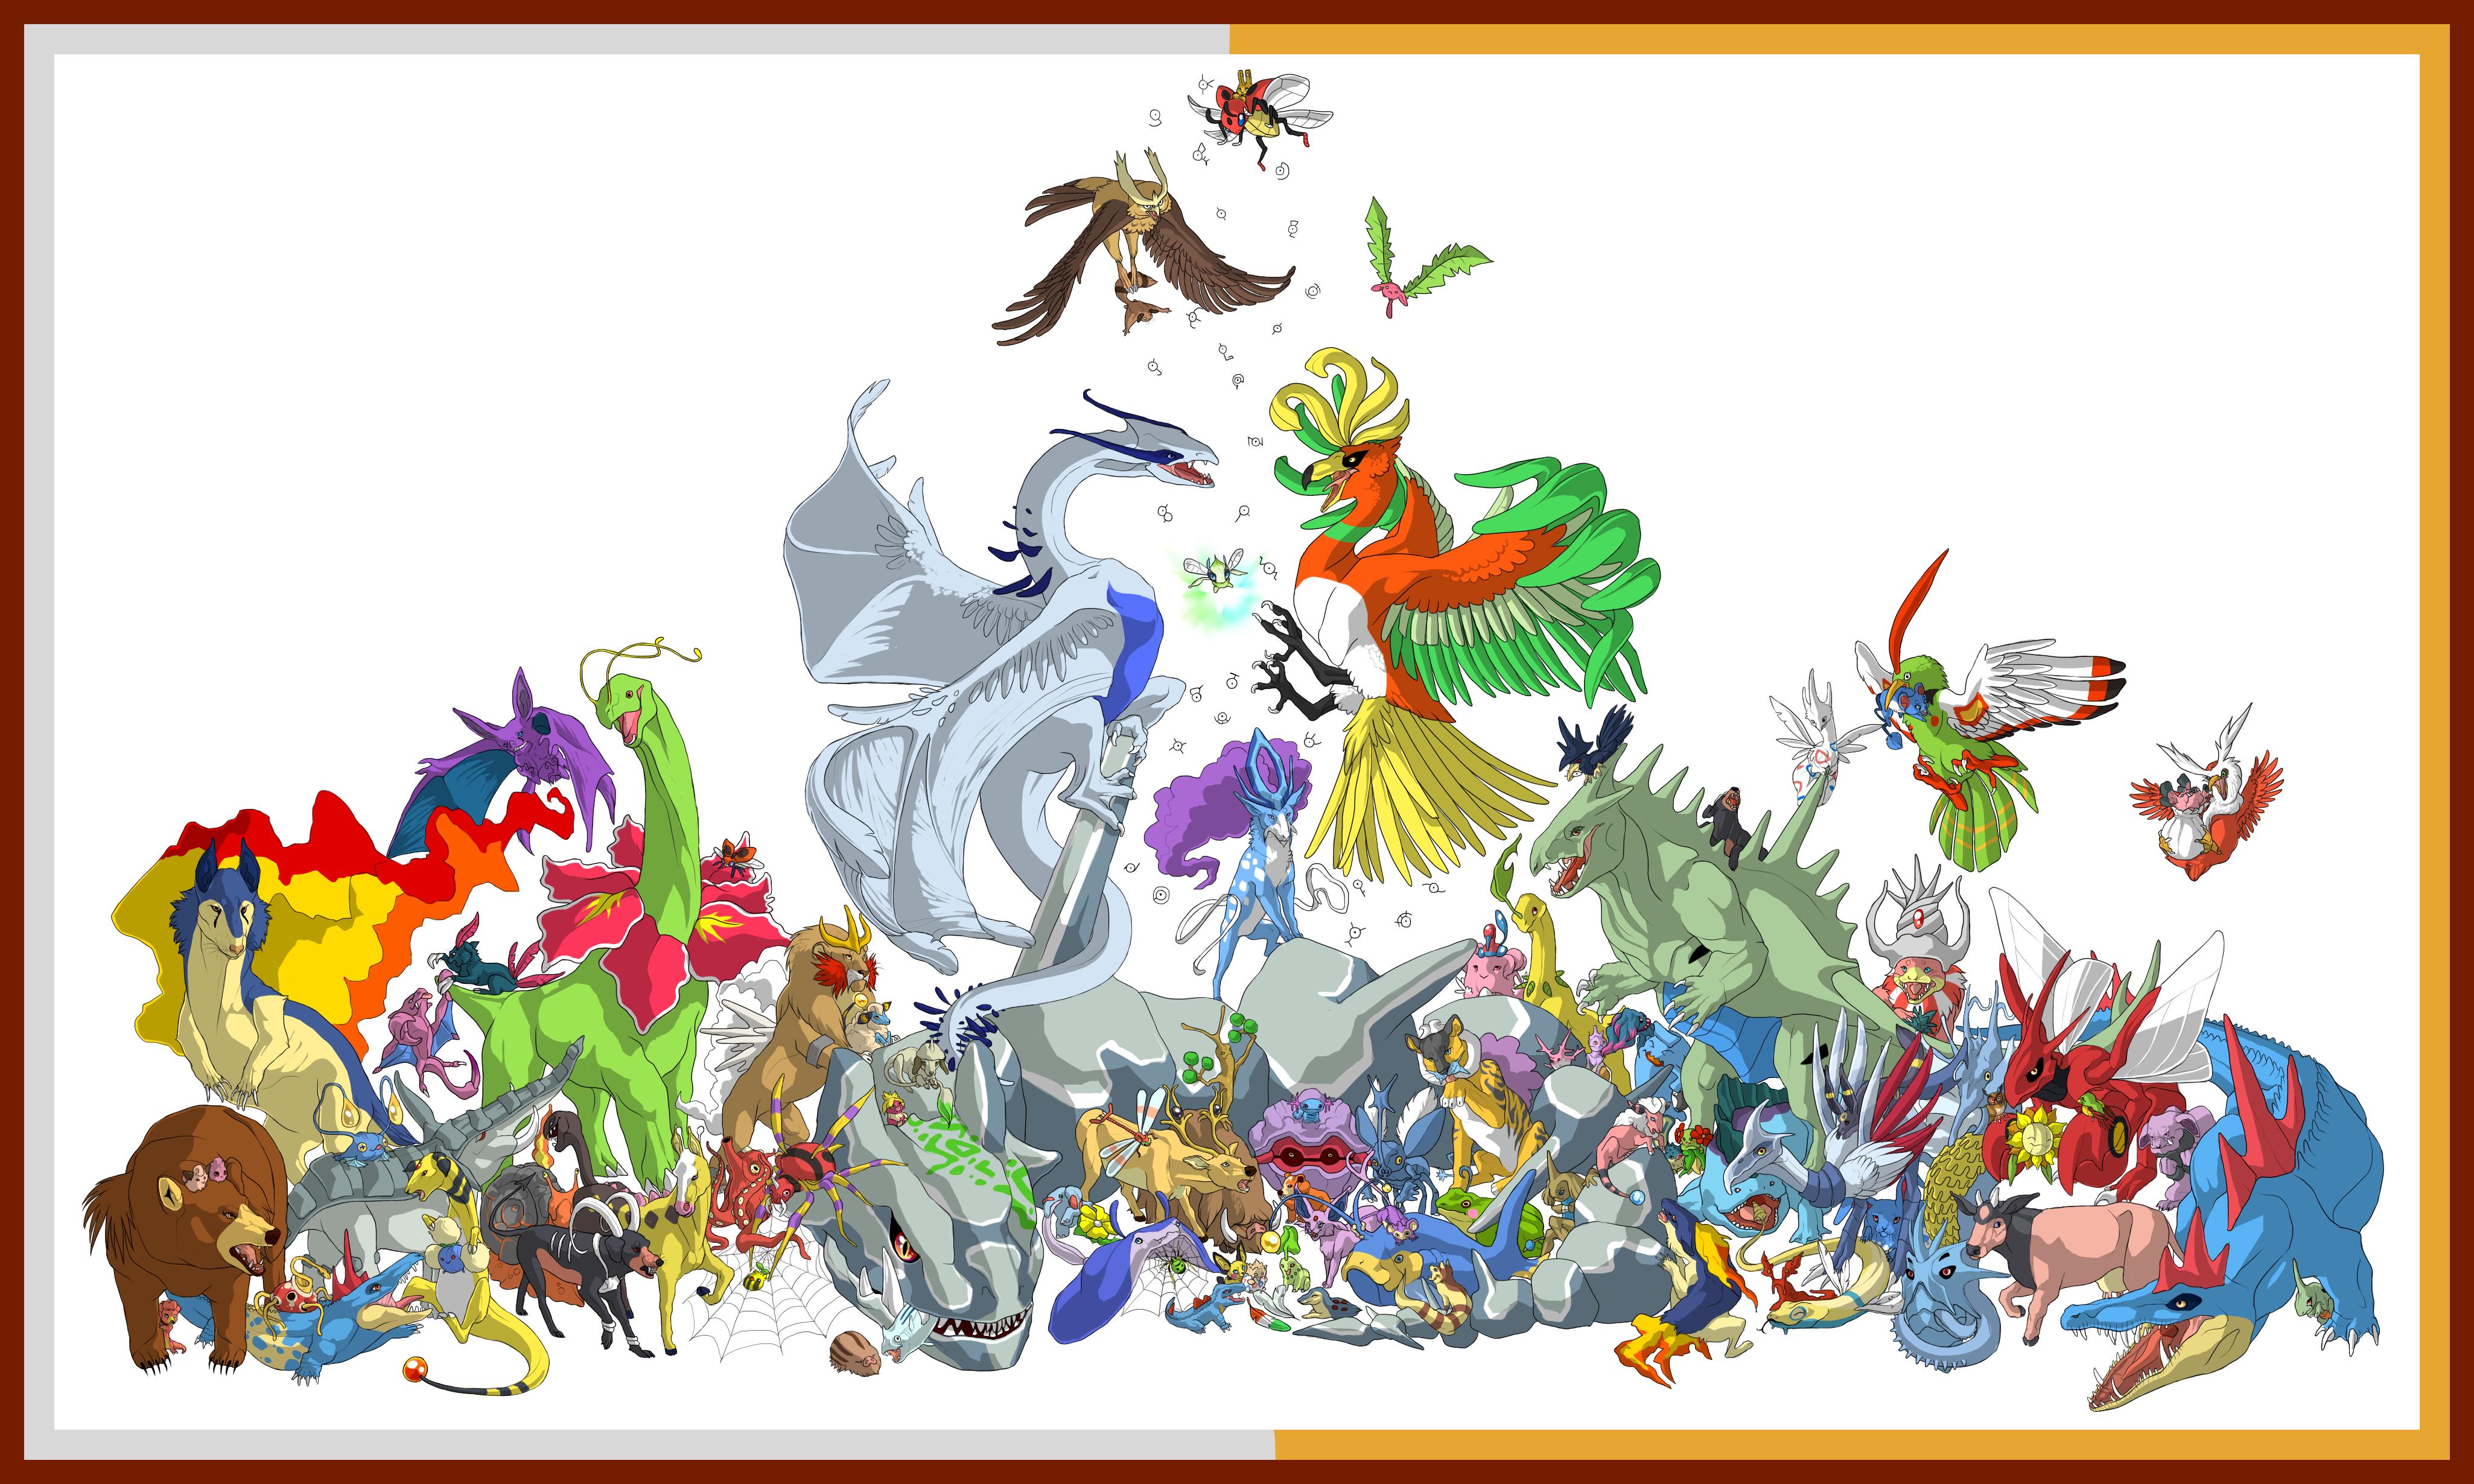 Every Second Generation Pokemon! by Speras on deviantART